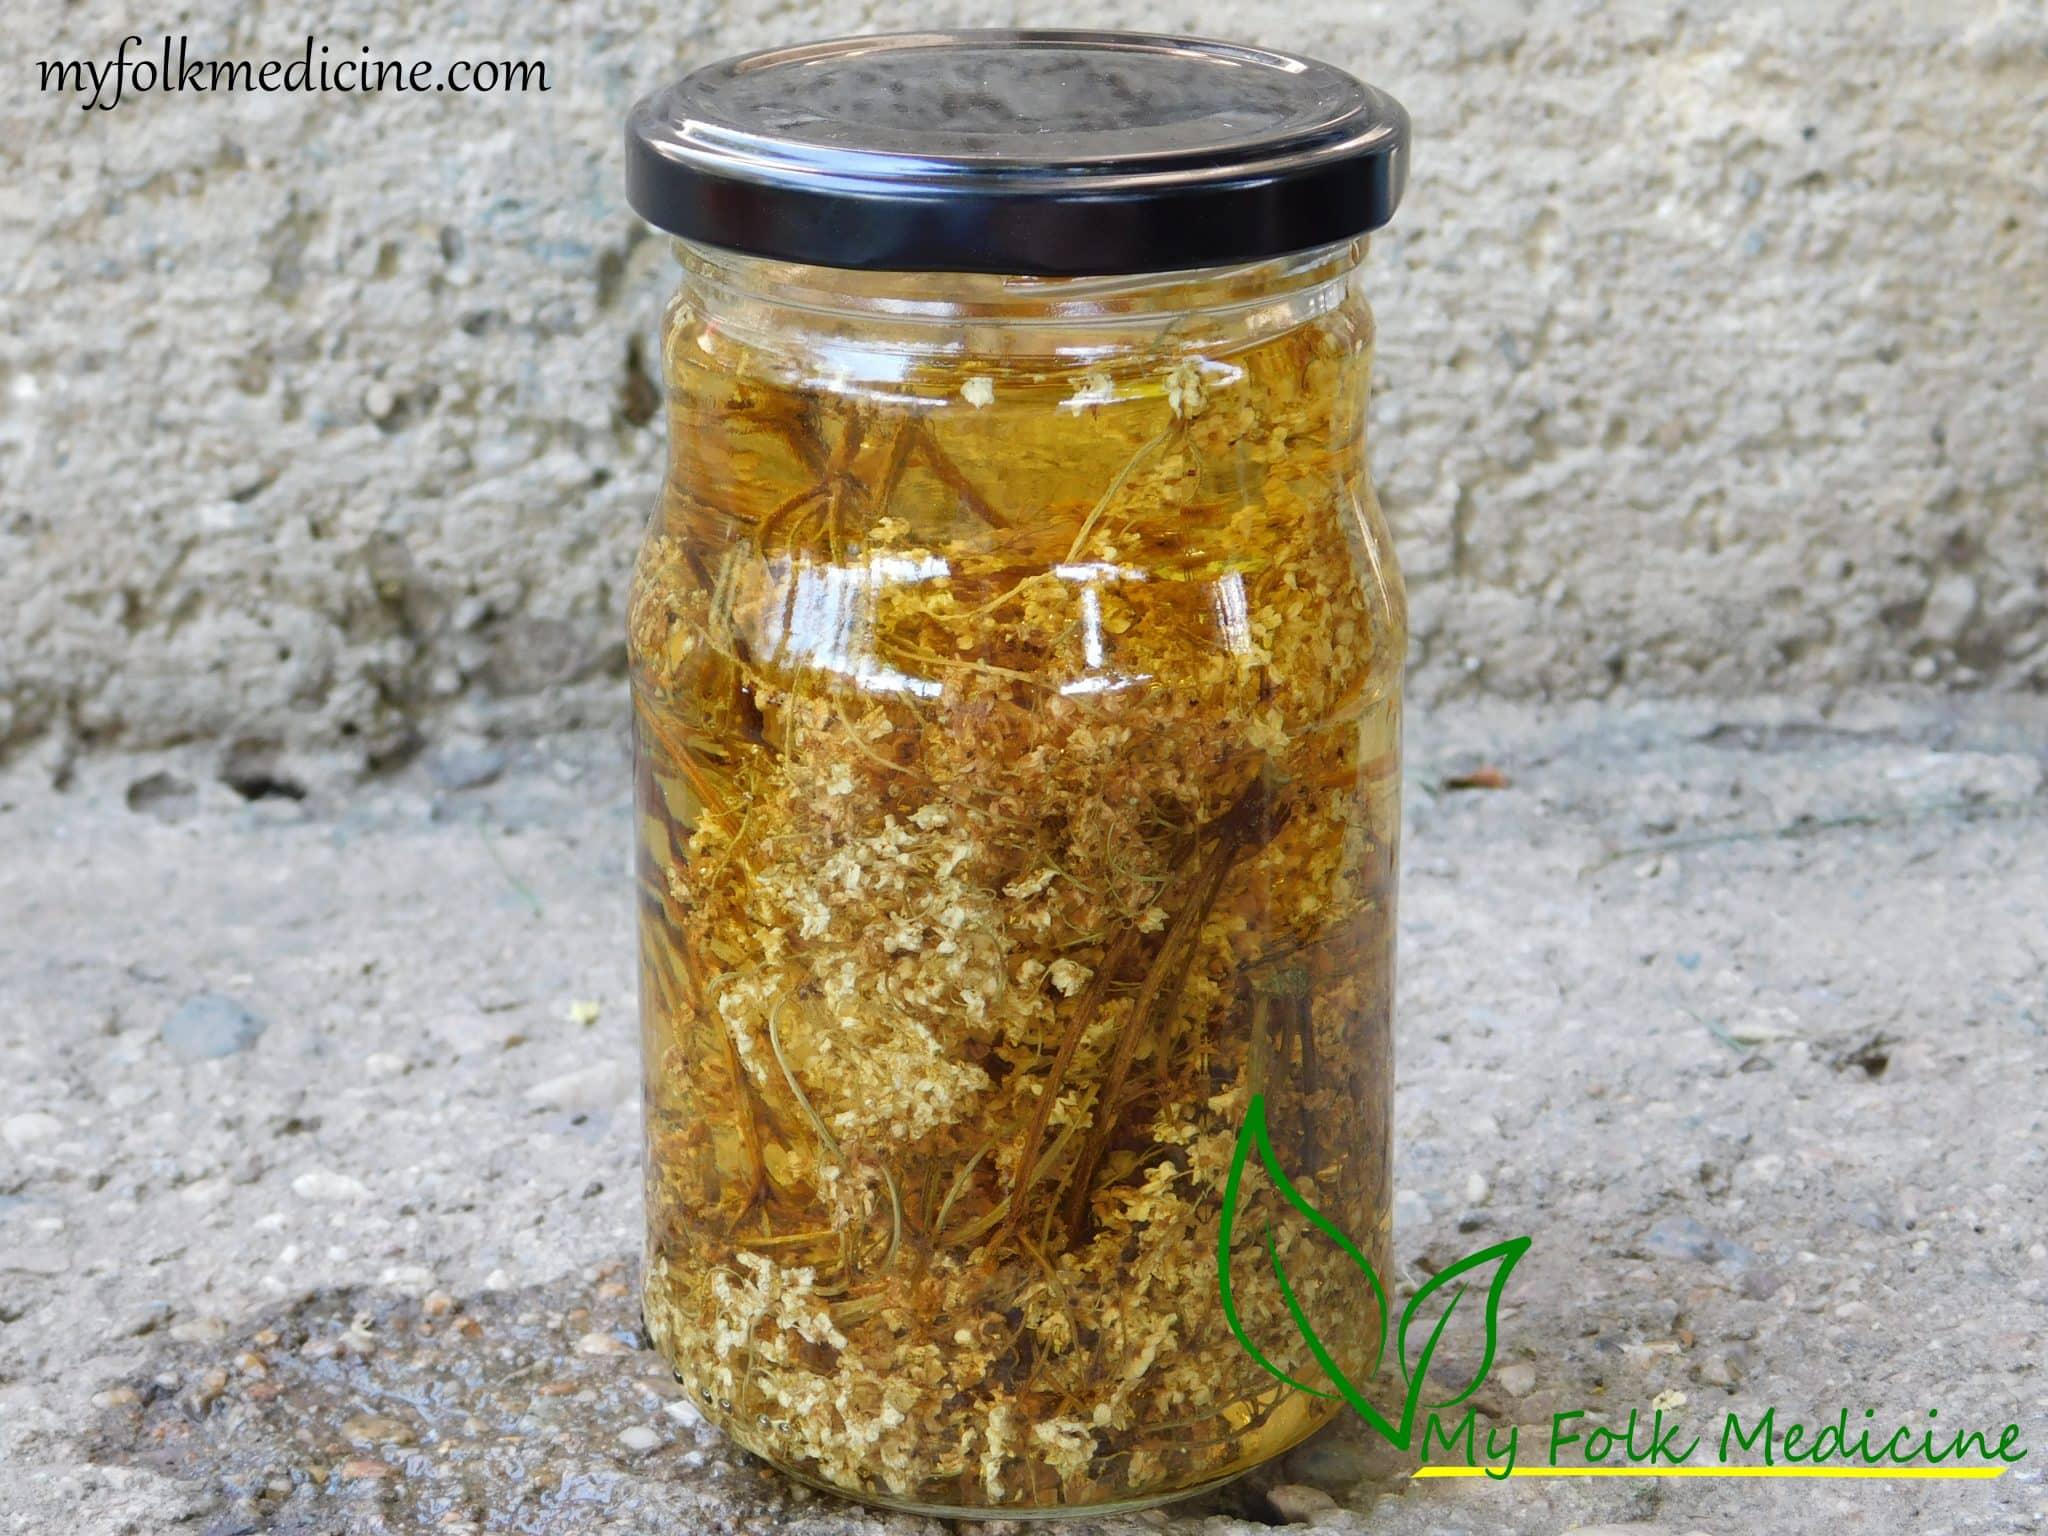 Elderflower Tincture Recipe for Cold, Flu, and Cough